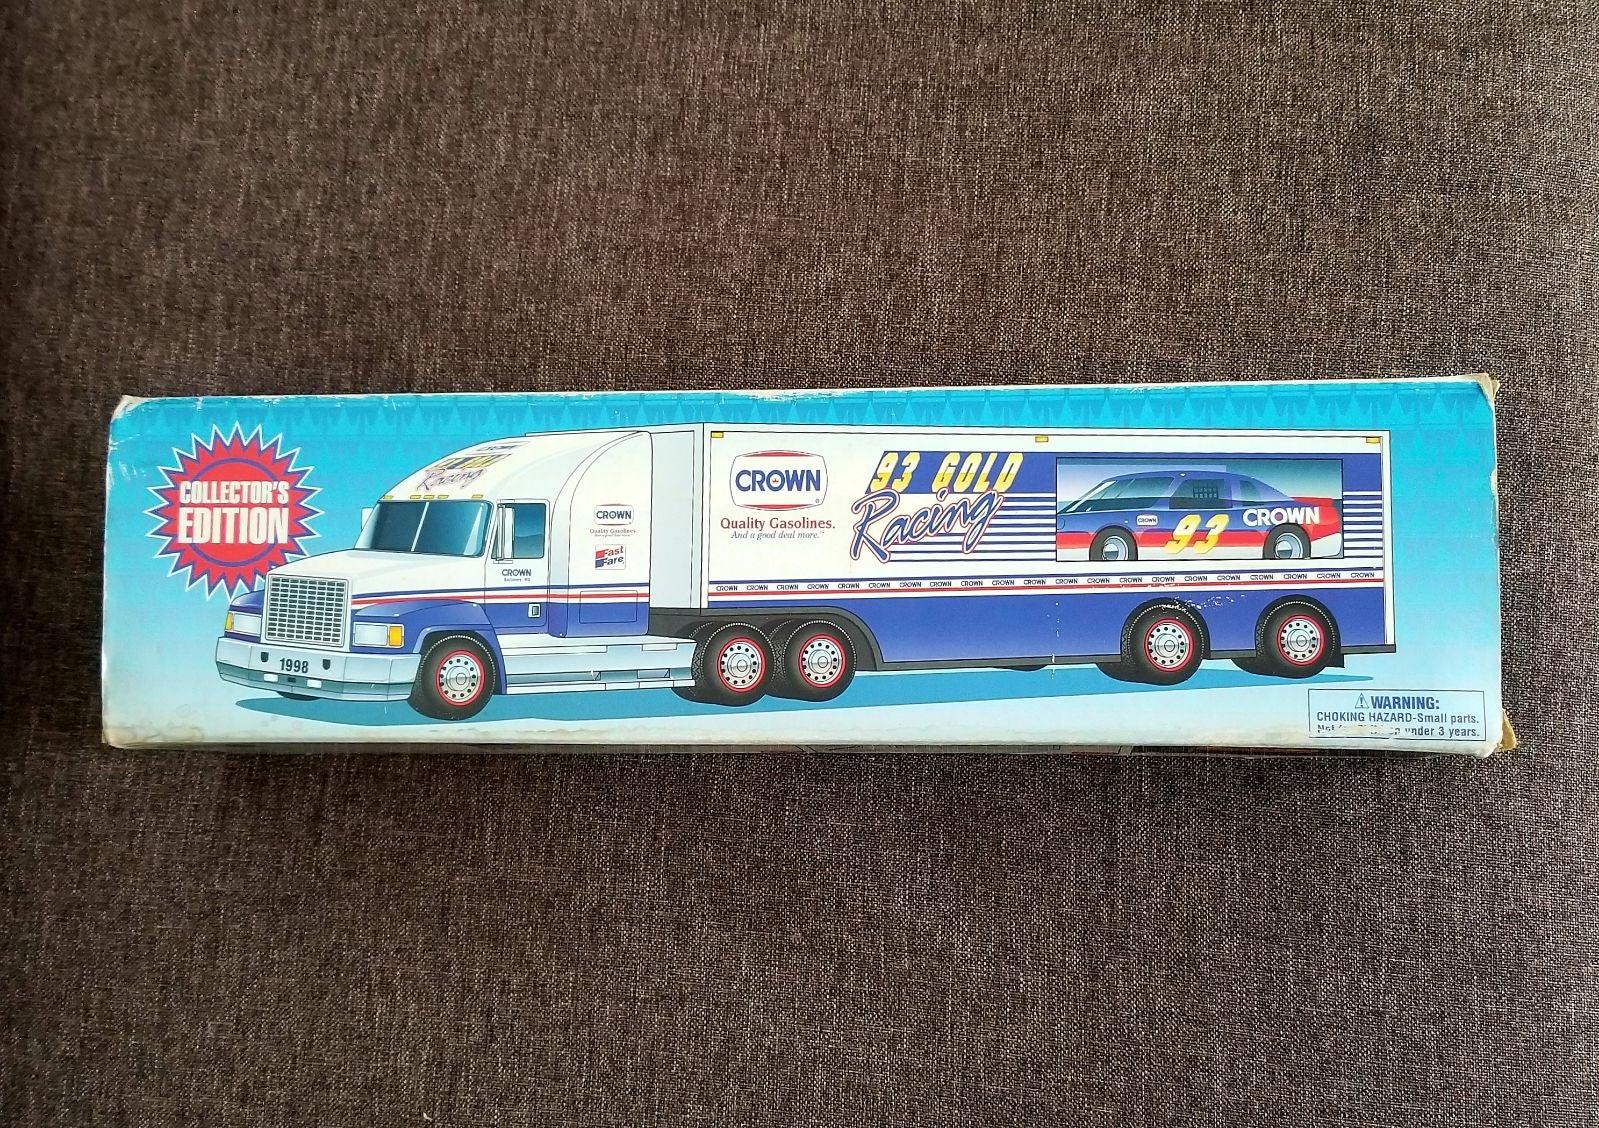 CROWN Race Car Carrier Semi Trailer '98